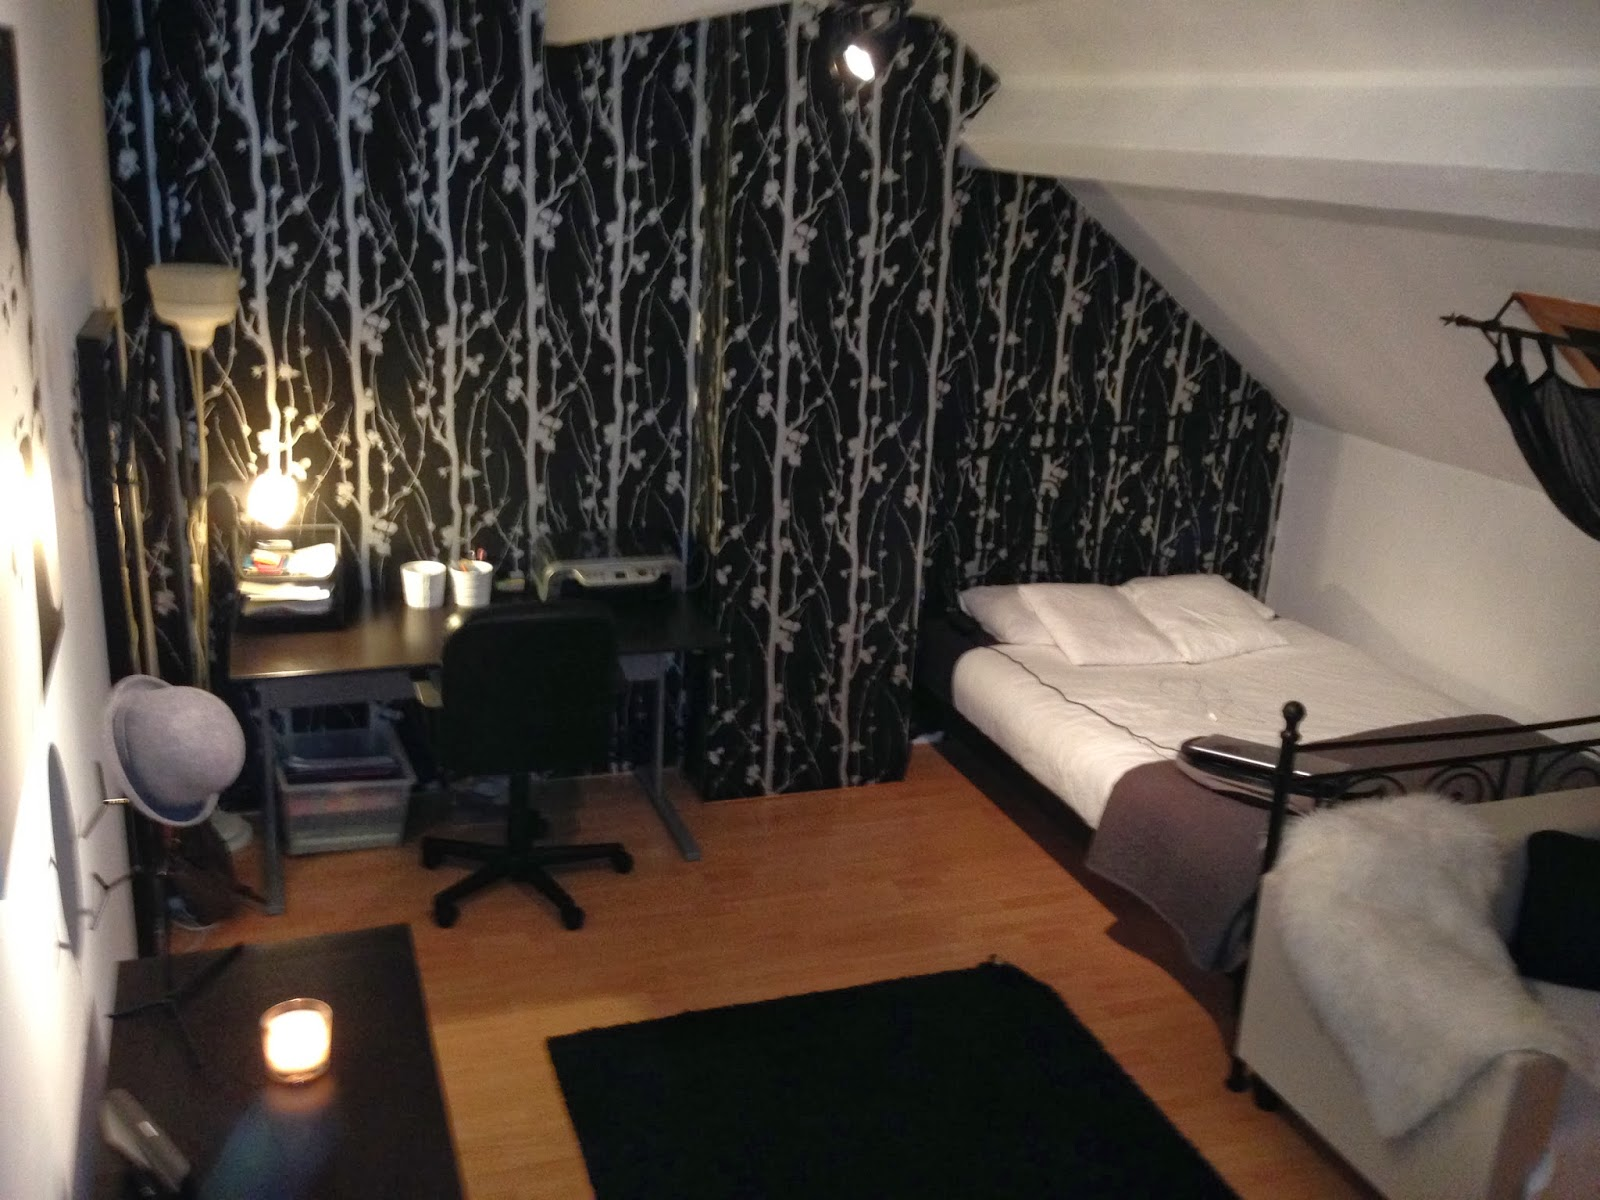 Peau De Mouton Grise Ikea vivahdream: room tour : ikea room !!!